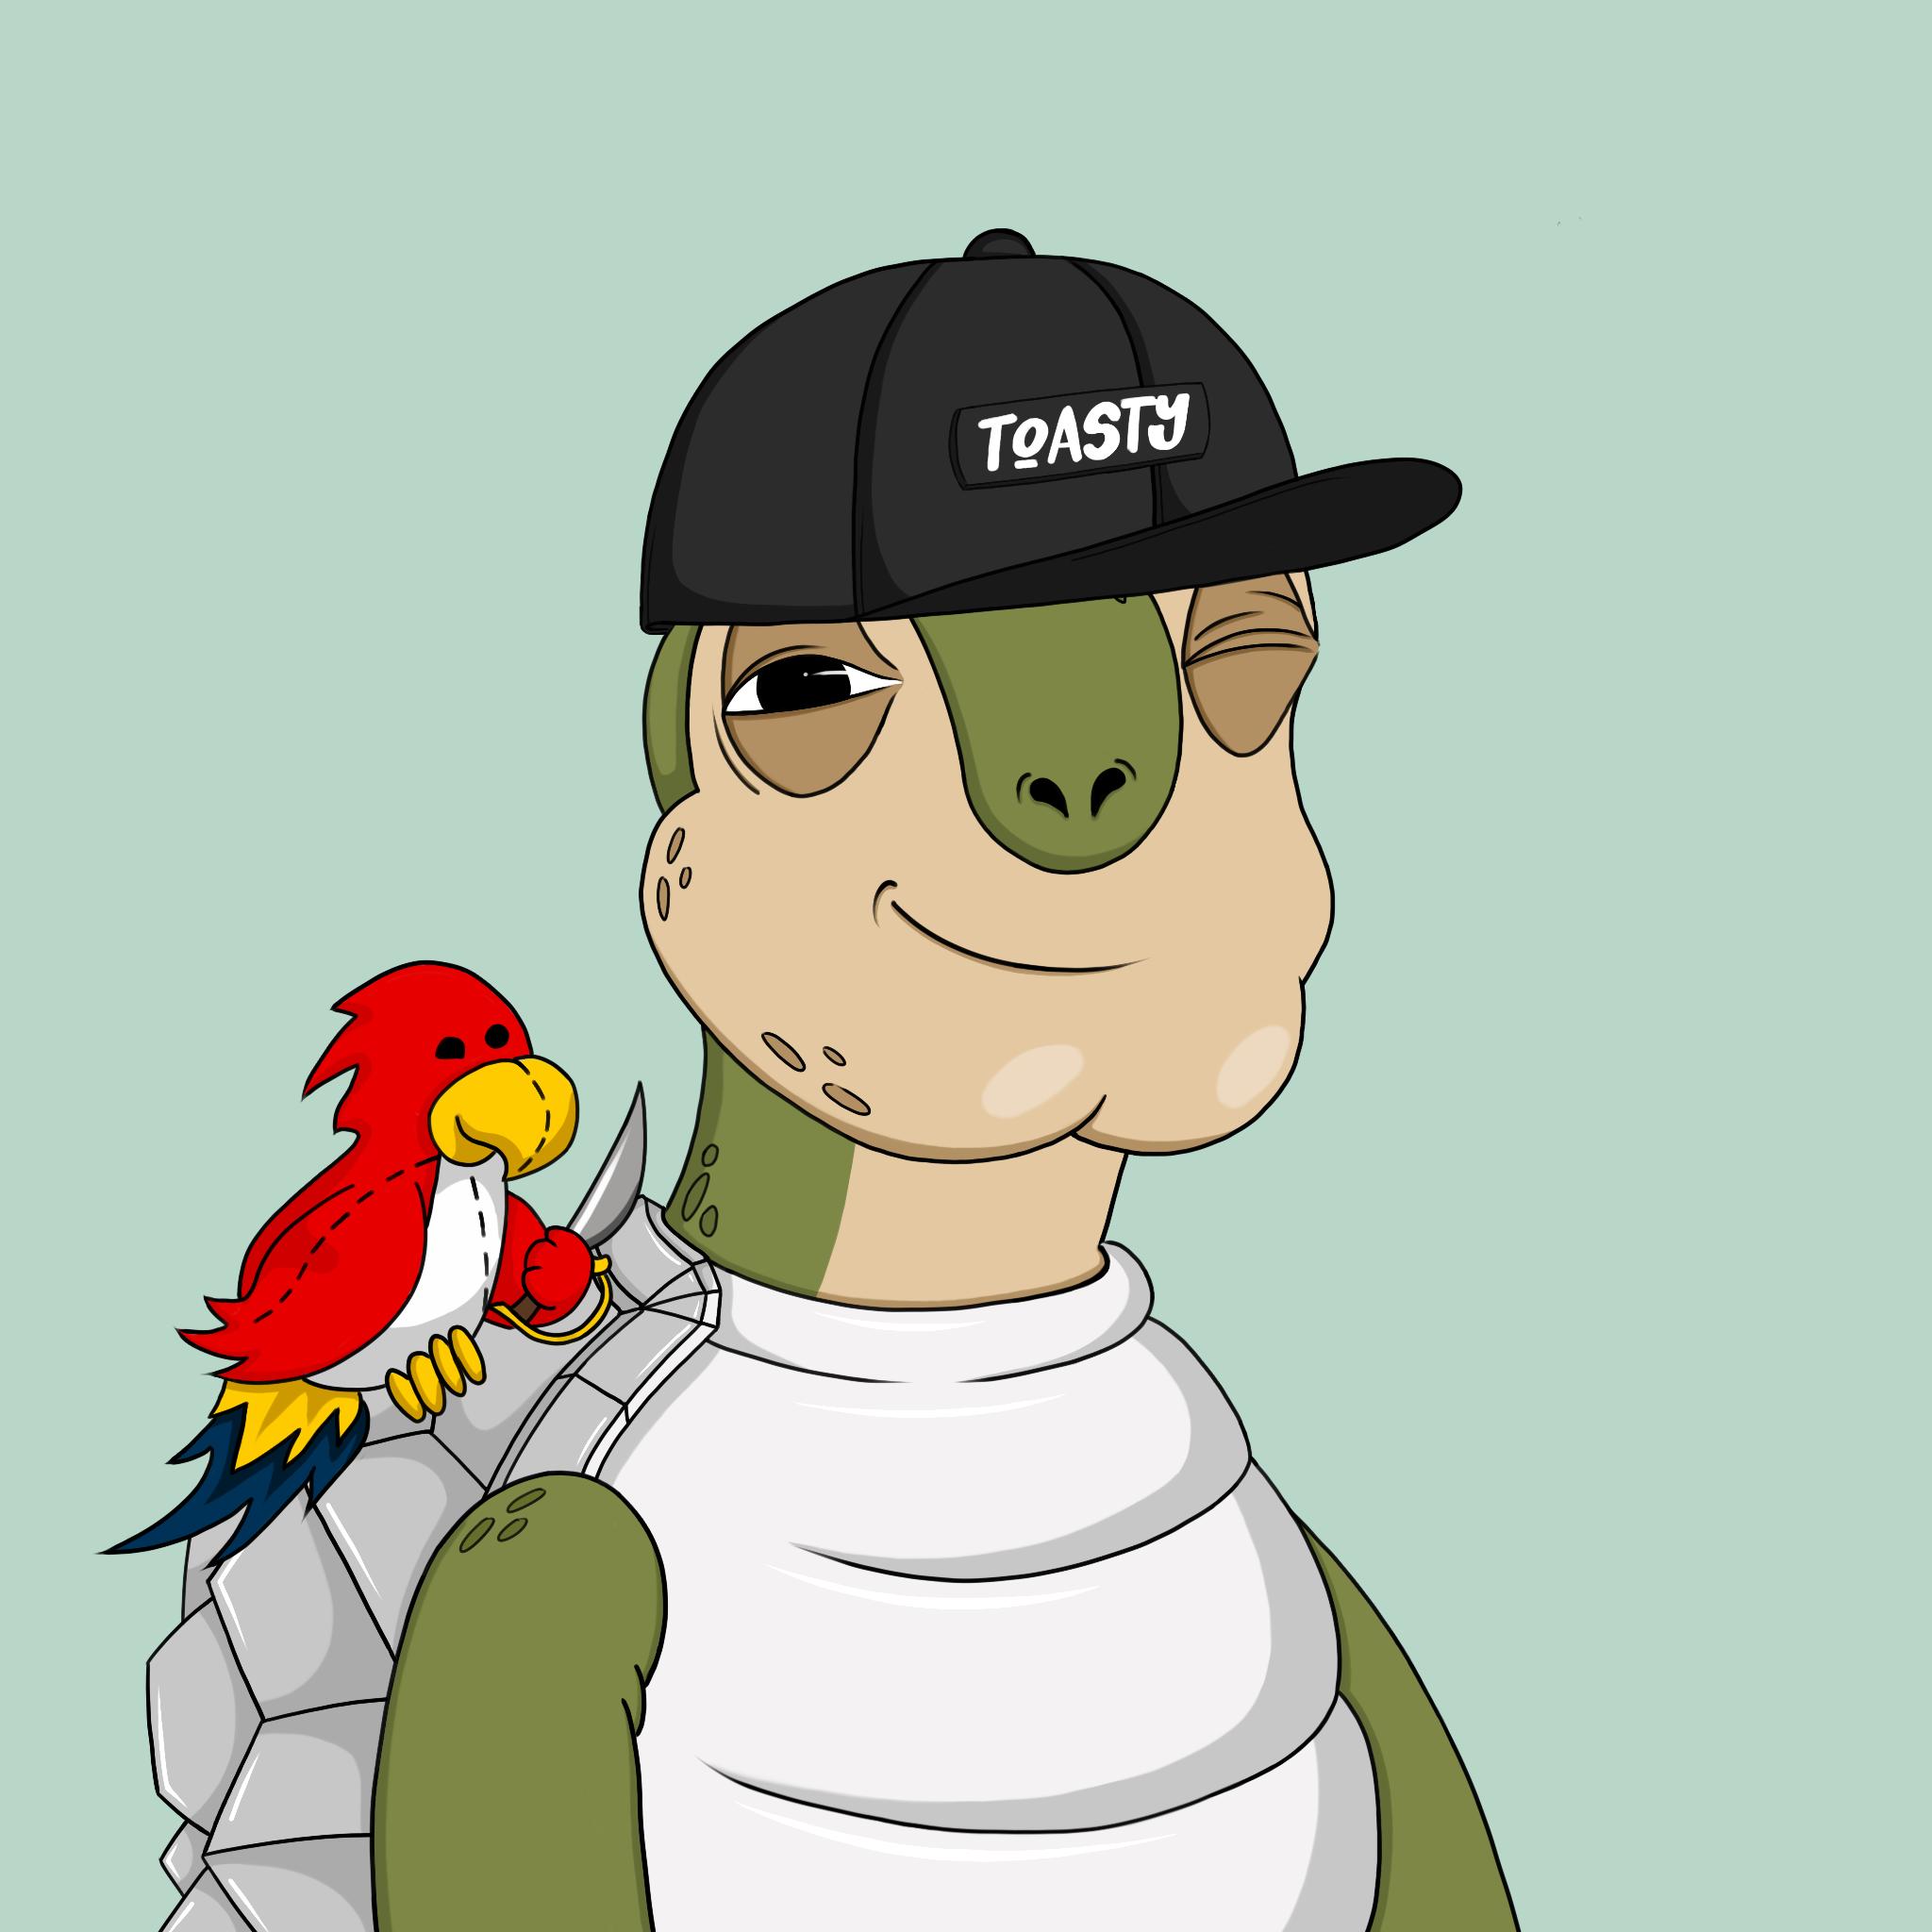 Toasy Turts #3413